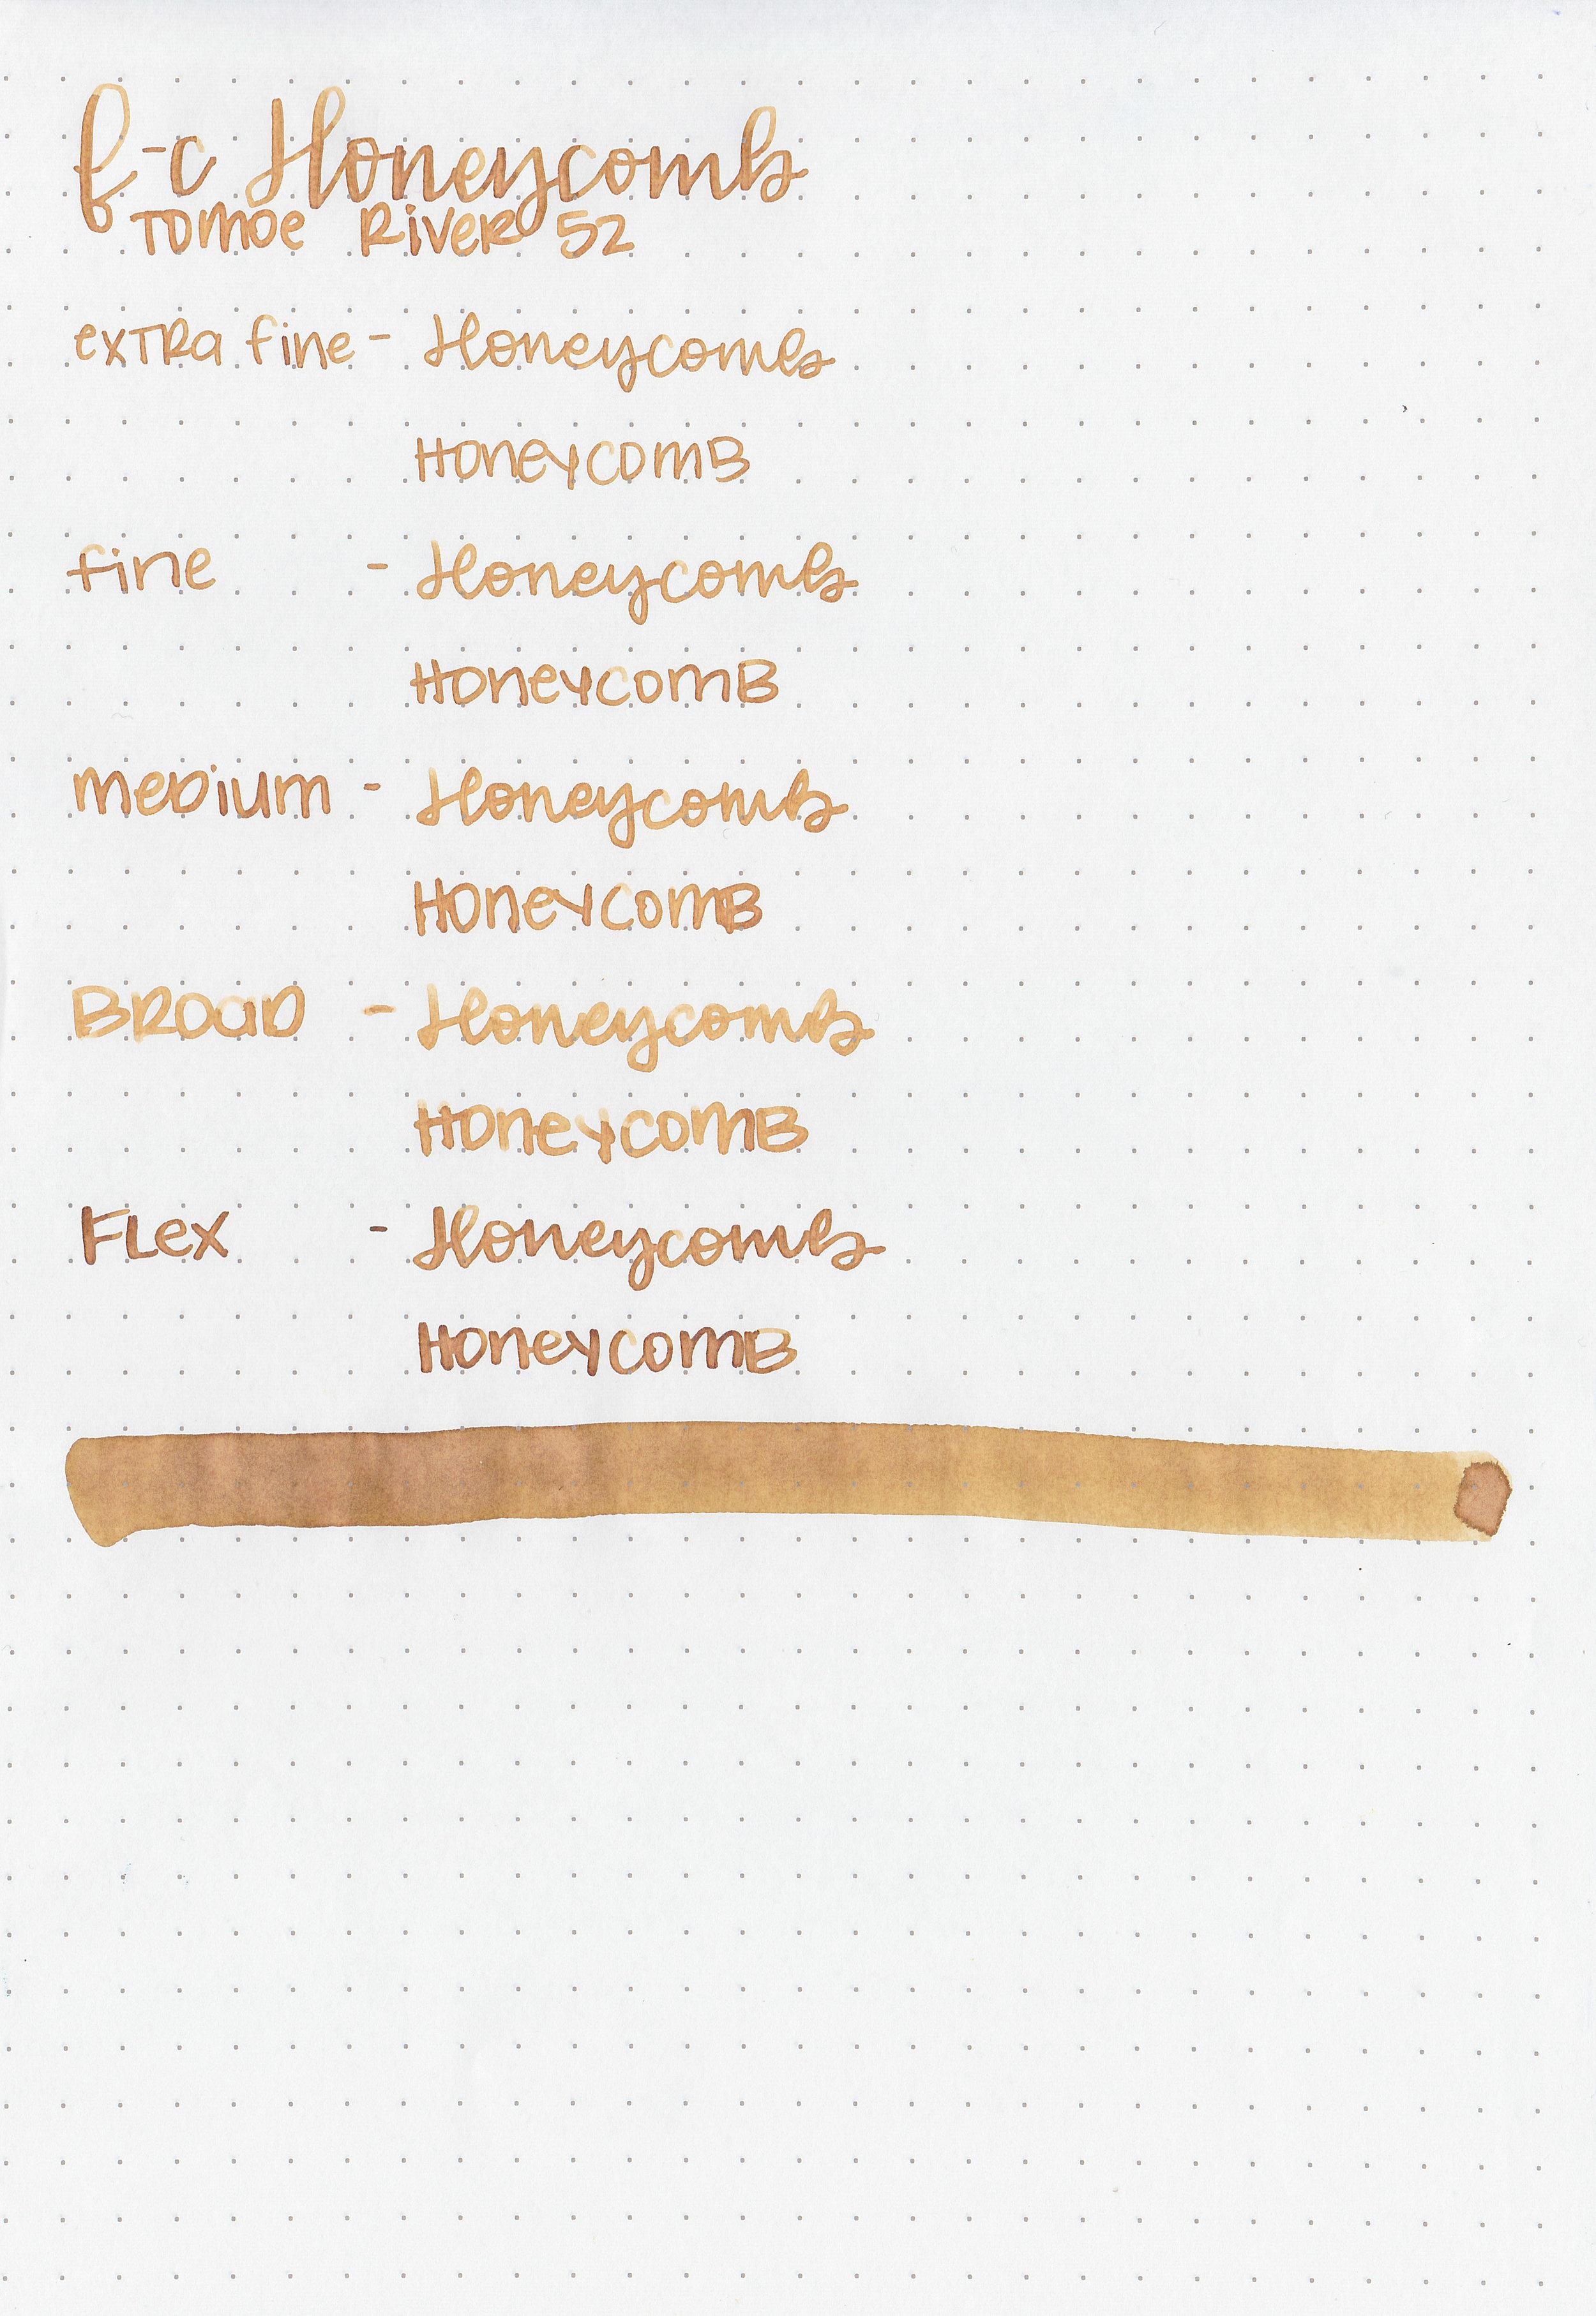 fc-honeycomb-7.jpg